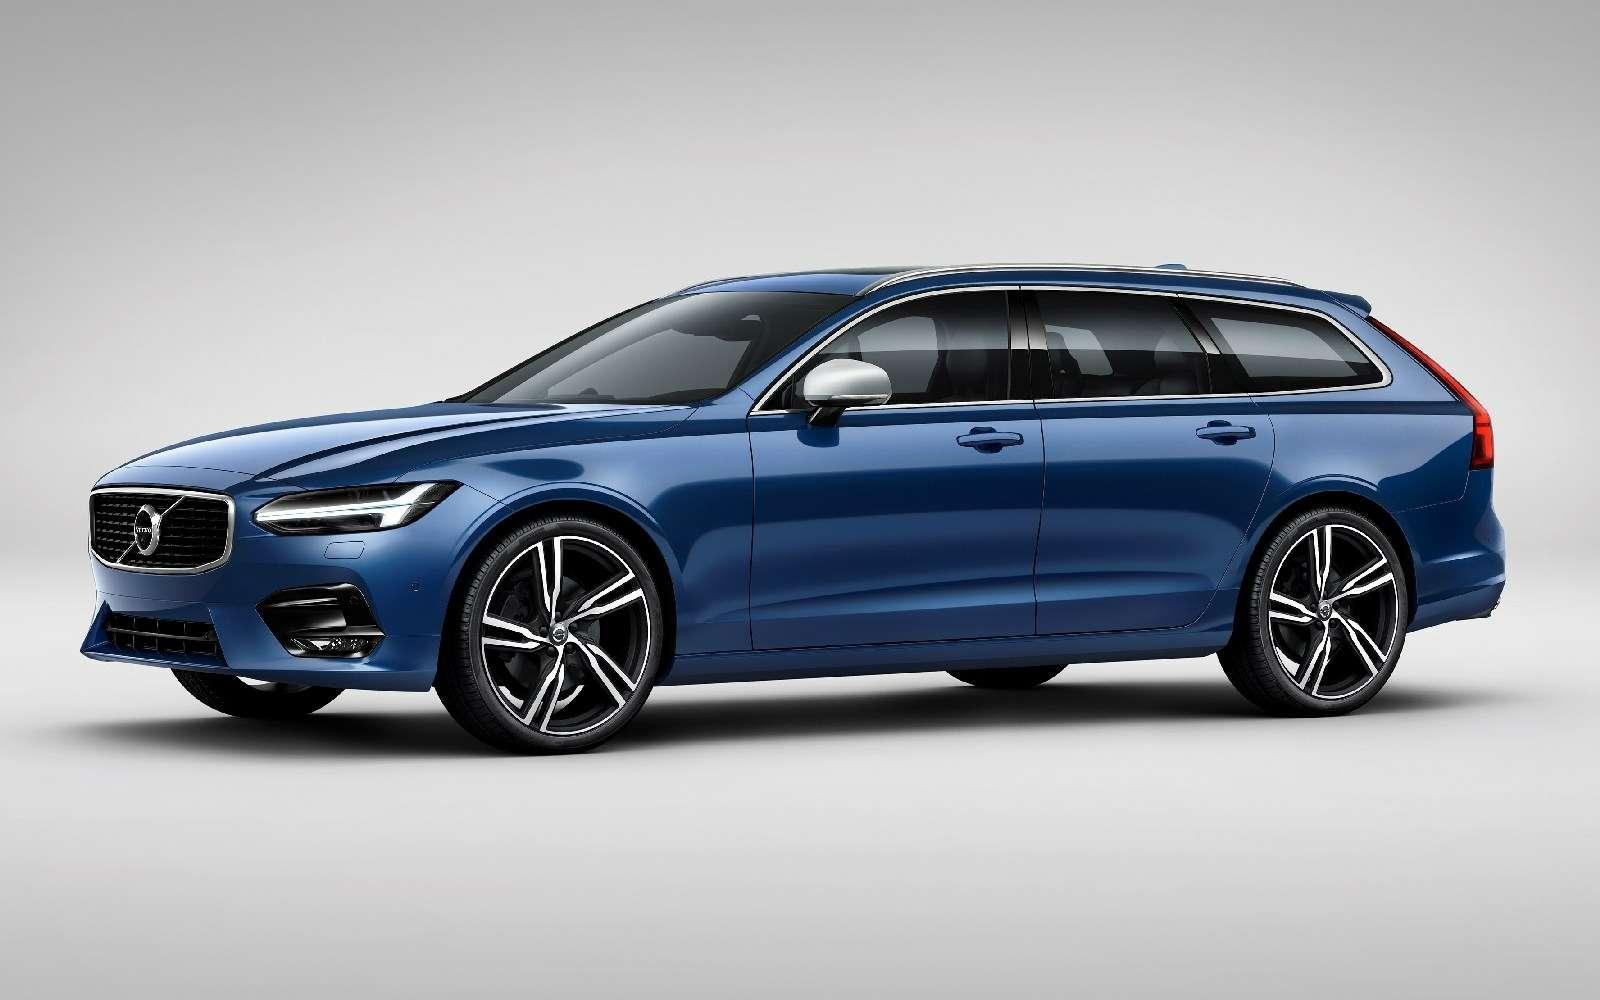 Volvo подготовила дляфлагманской модели спортпакет R-Design— фото 600926